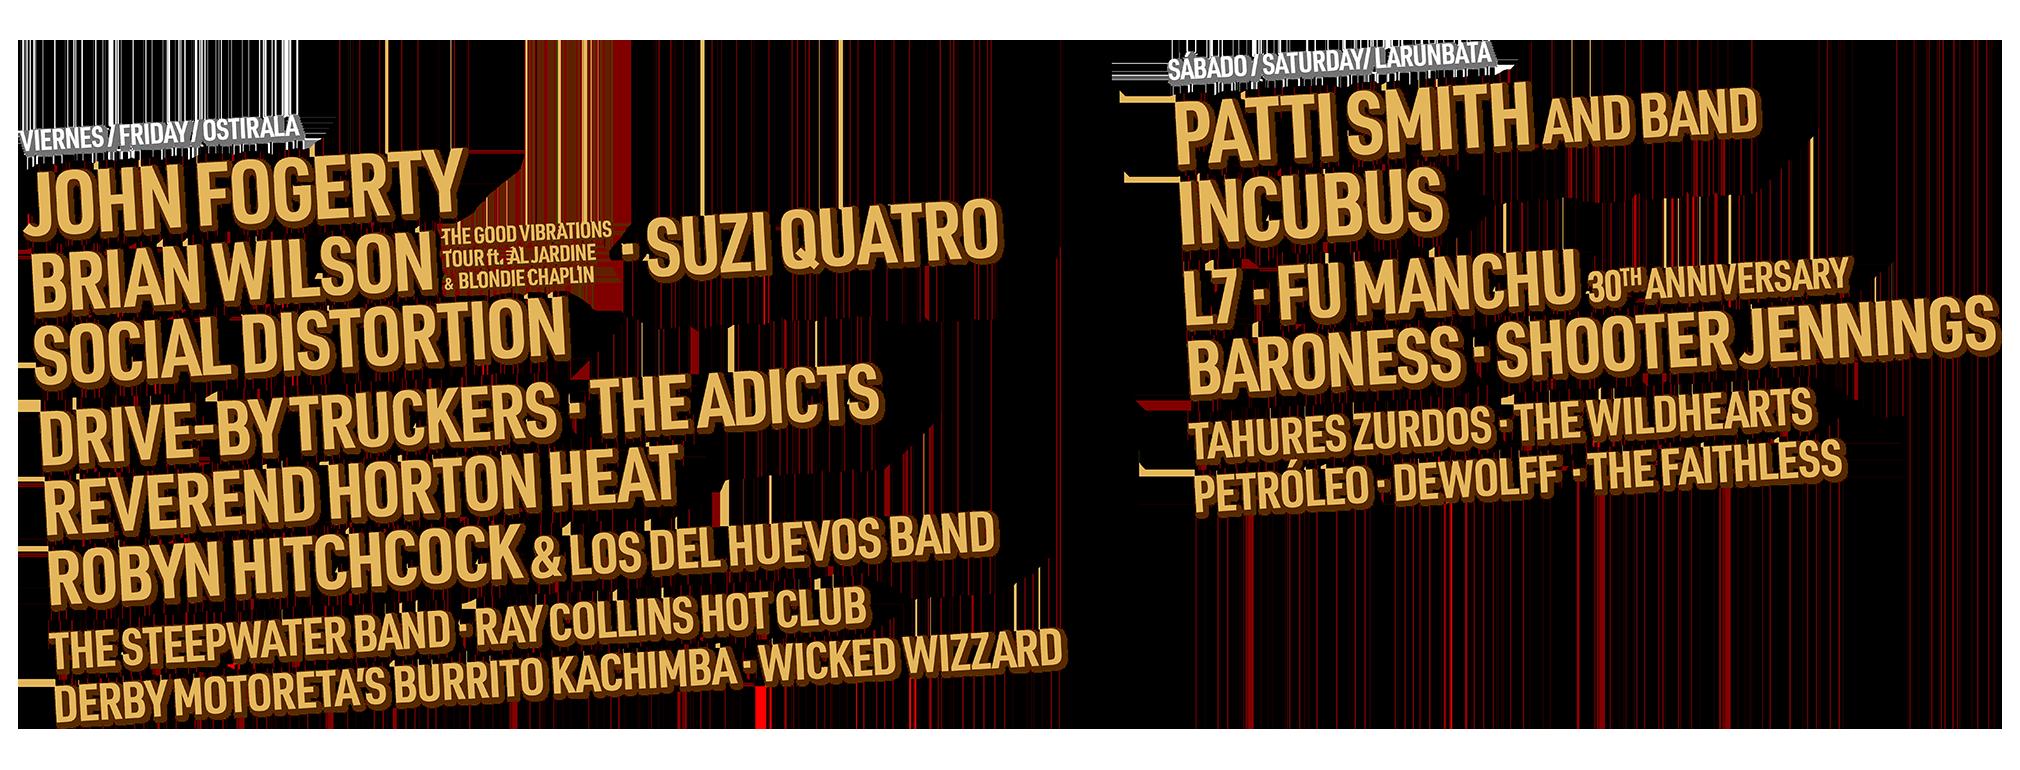 Azkena Rock Festival 2020. 19-20 Junio. Fogerty, Incubus, Suzi Quatro, Brian Wilson, Drive by Truckers, Baroness, Shooter Jennings... - Página 4 ARF20-LINE-UP-POR-DIA-2020x770